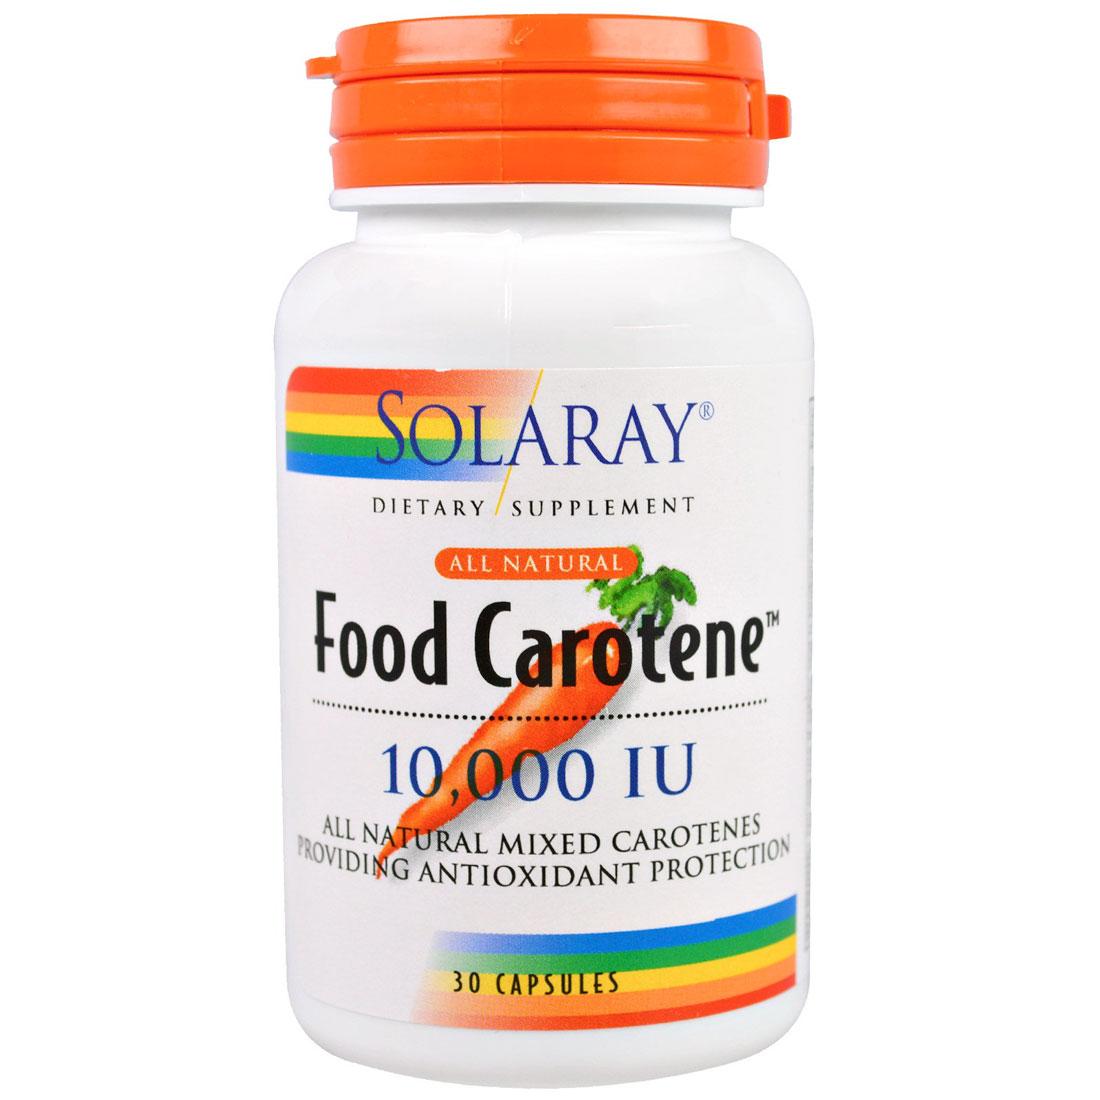 Image of a Bottle of Solaray Food Carotene All Natural 10,000 IU Softgels (Vitamin A)